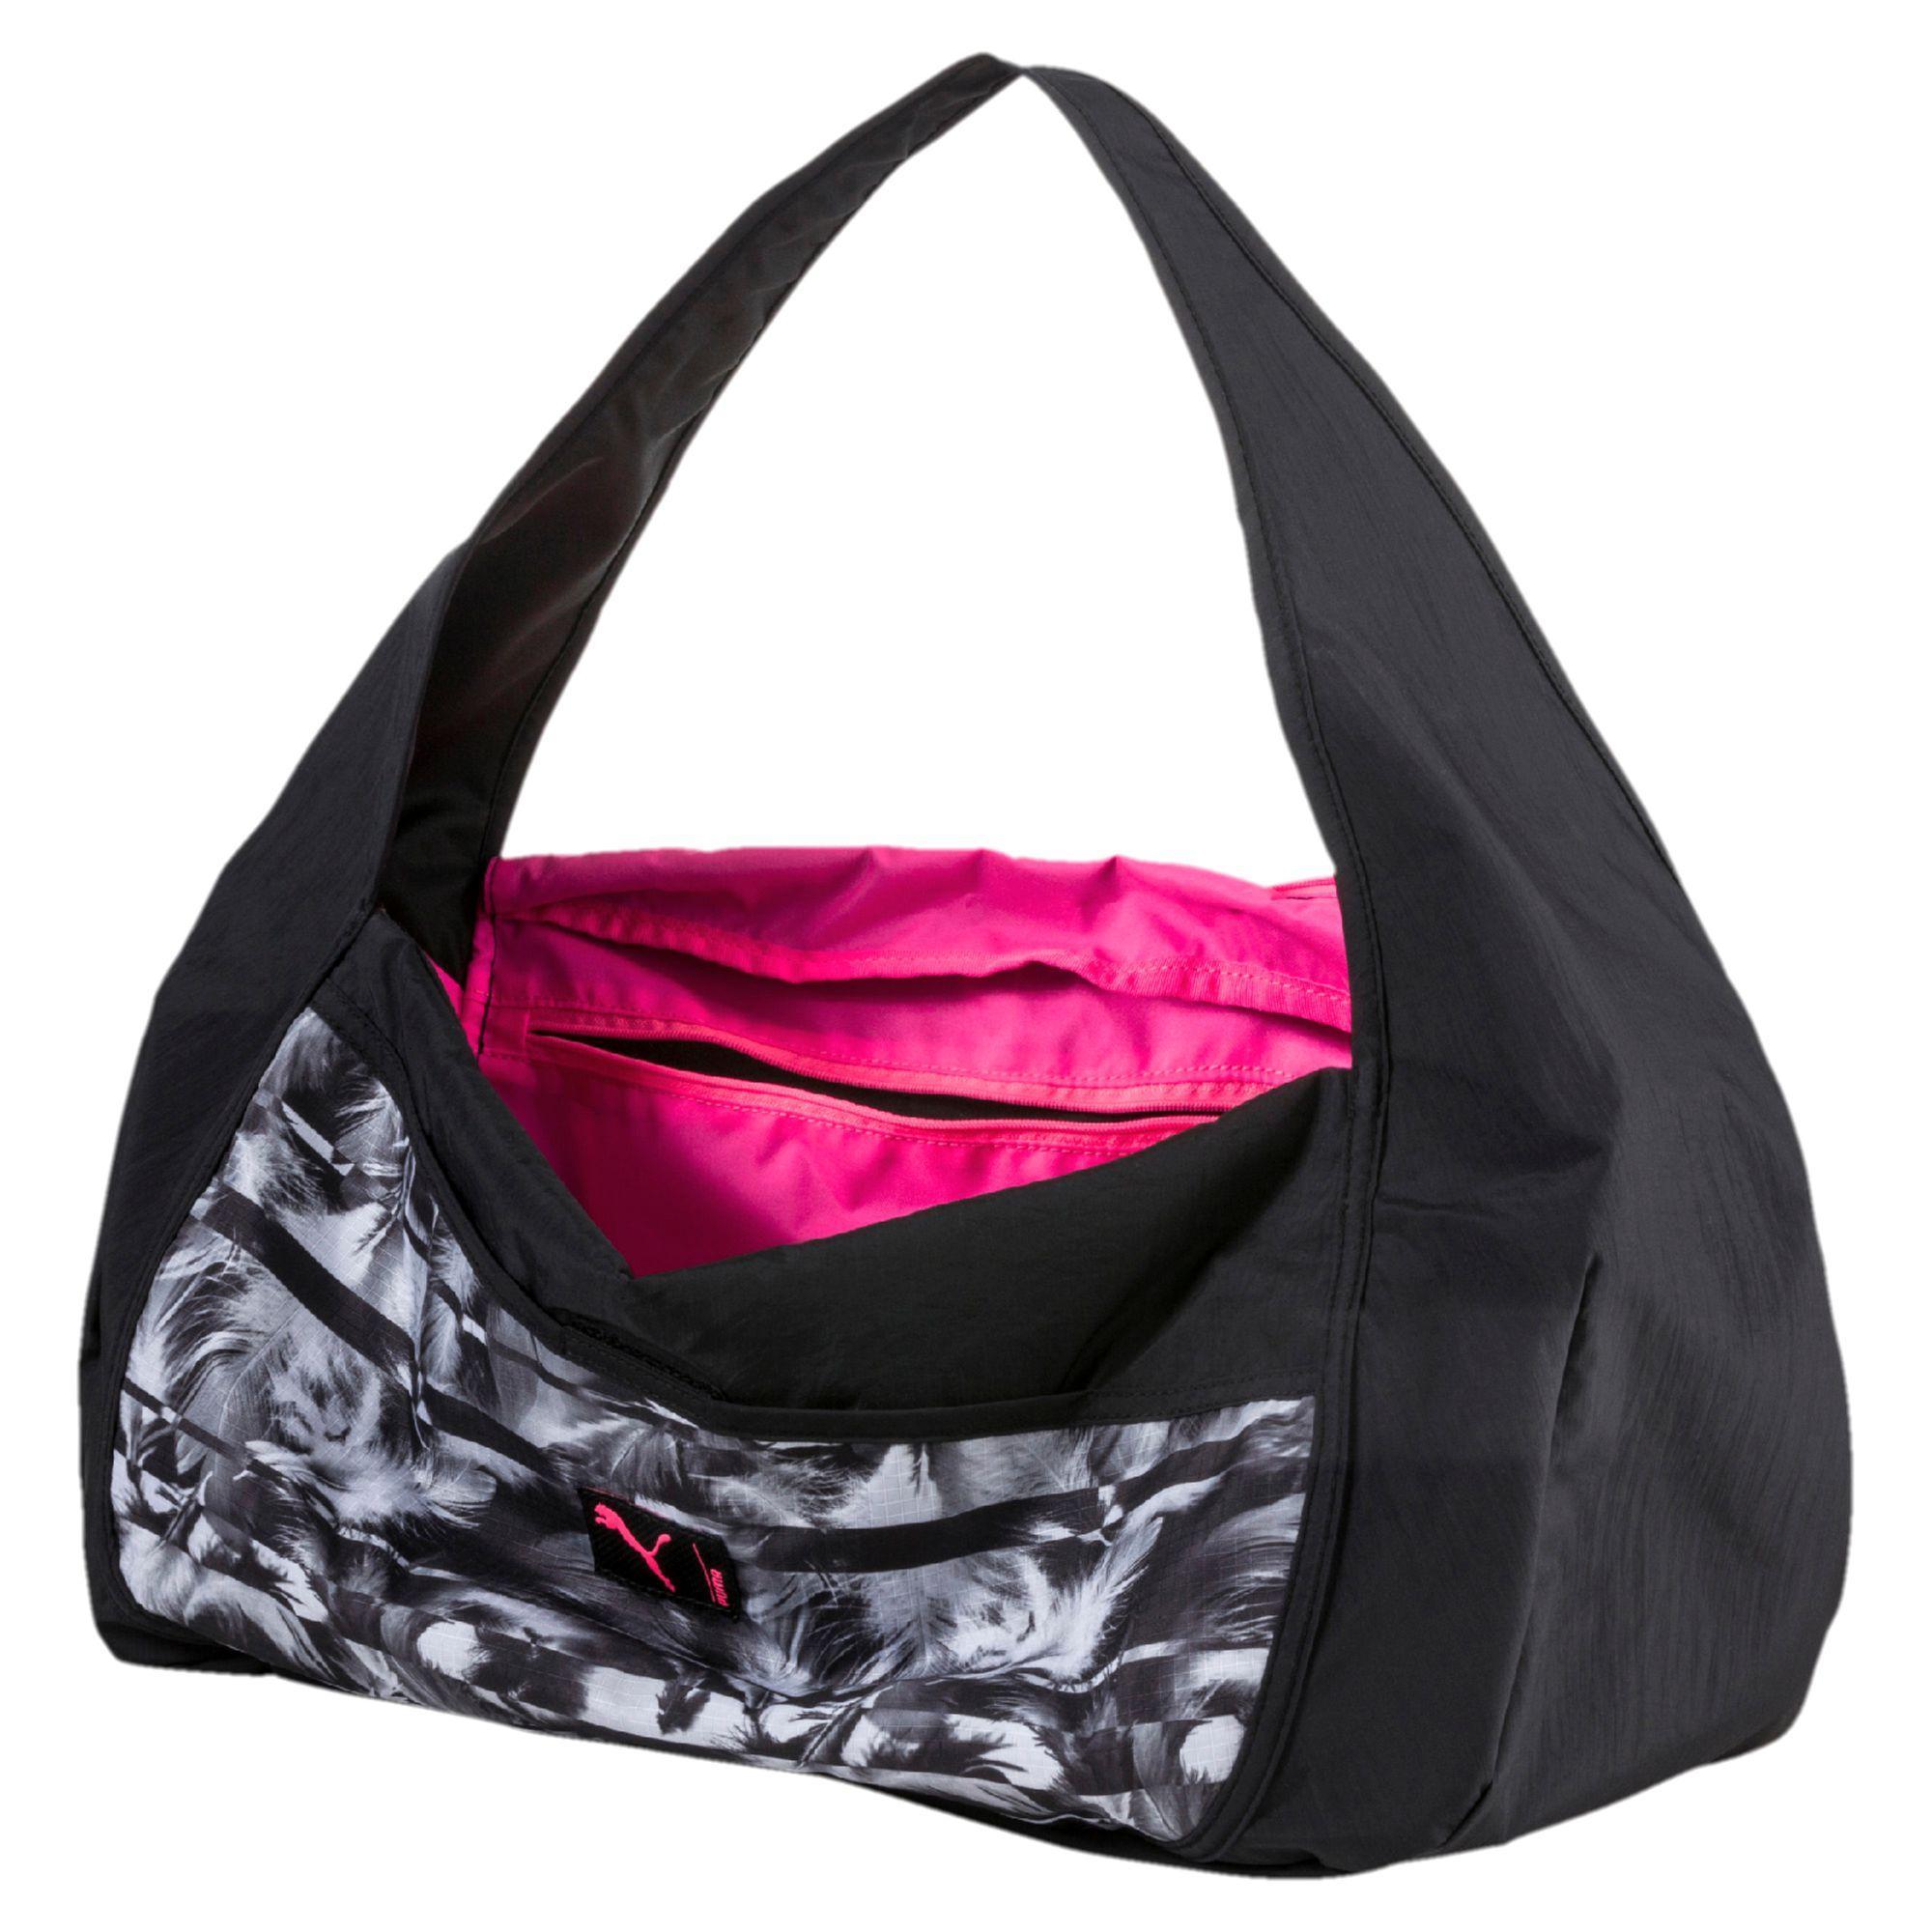 Lyst - PUMA Studio Barrel Duffel Bag in Black ecd1c49e4cc48